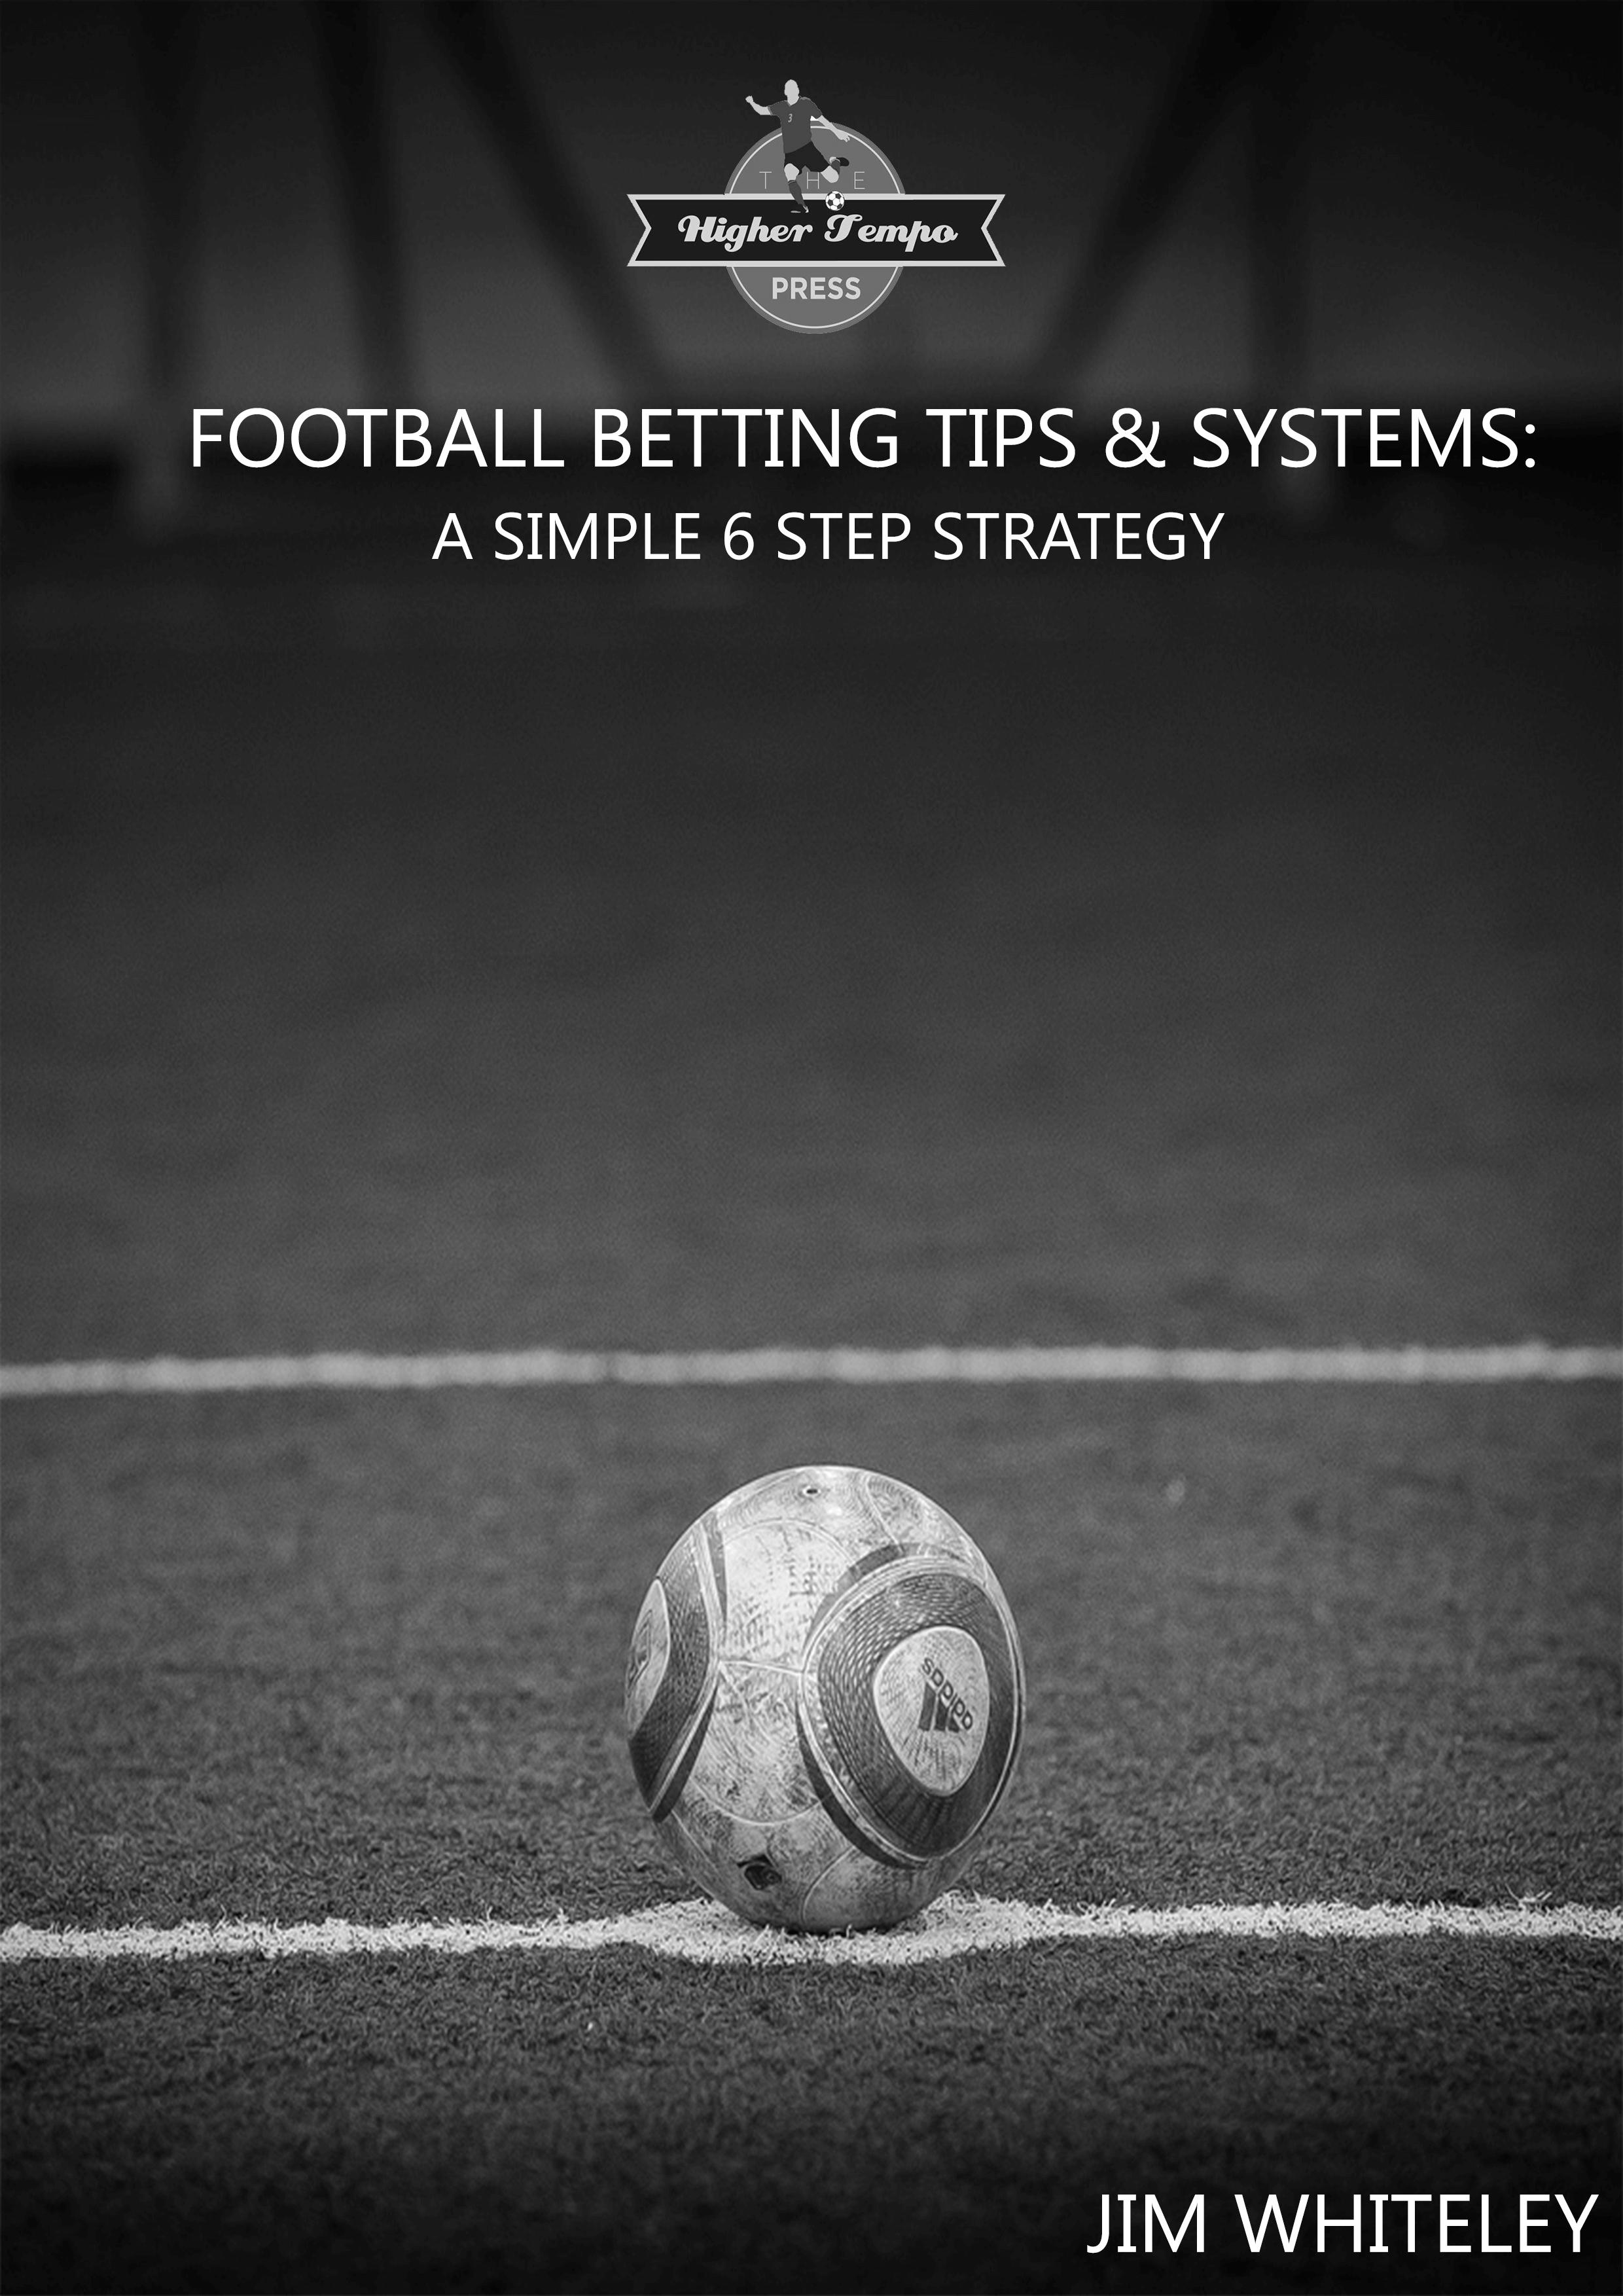 Football betting books 138 bettingadvice